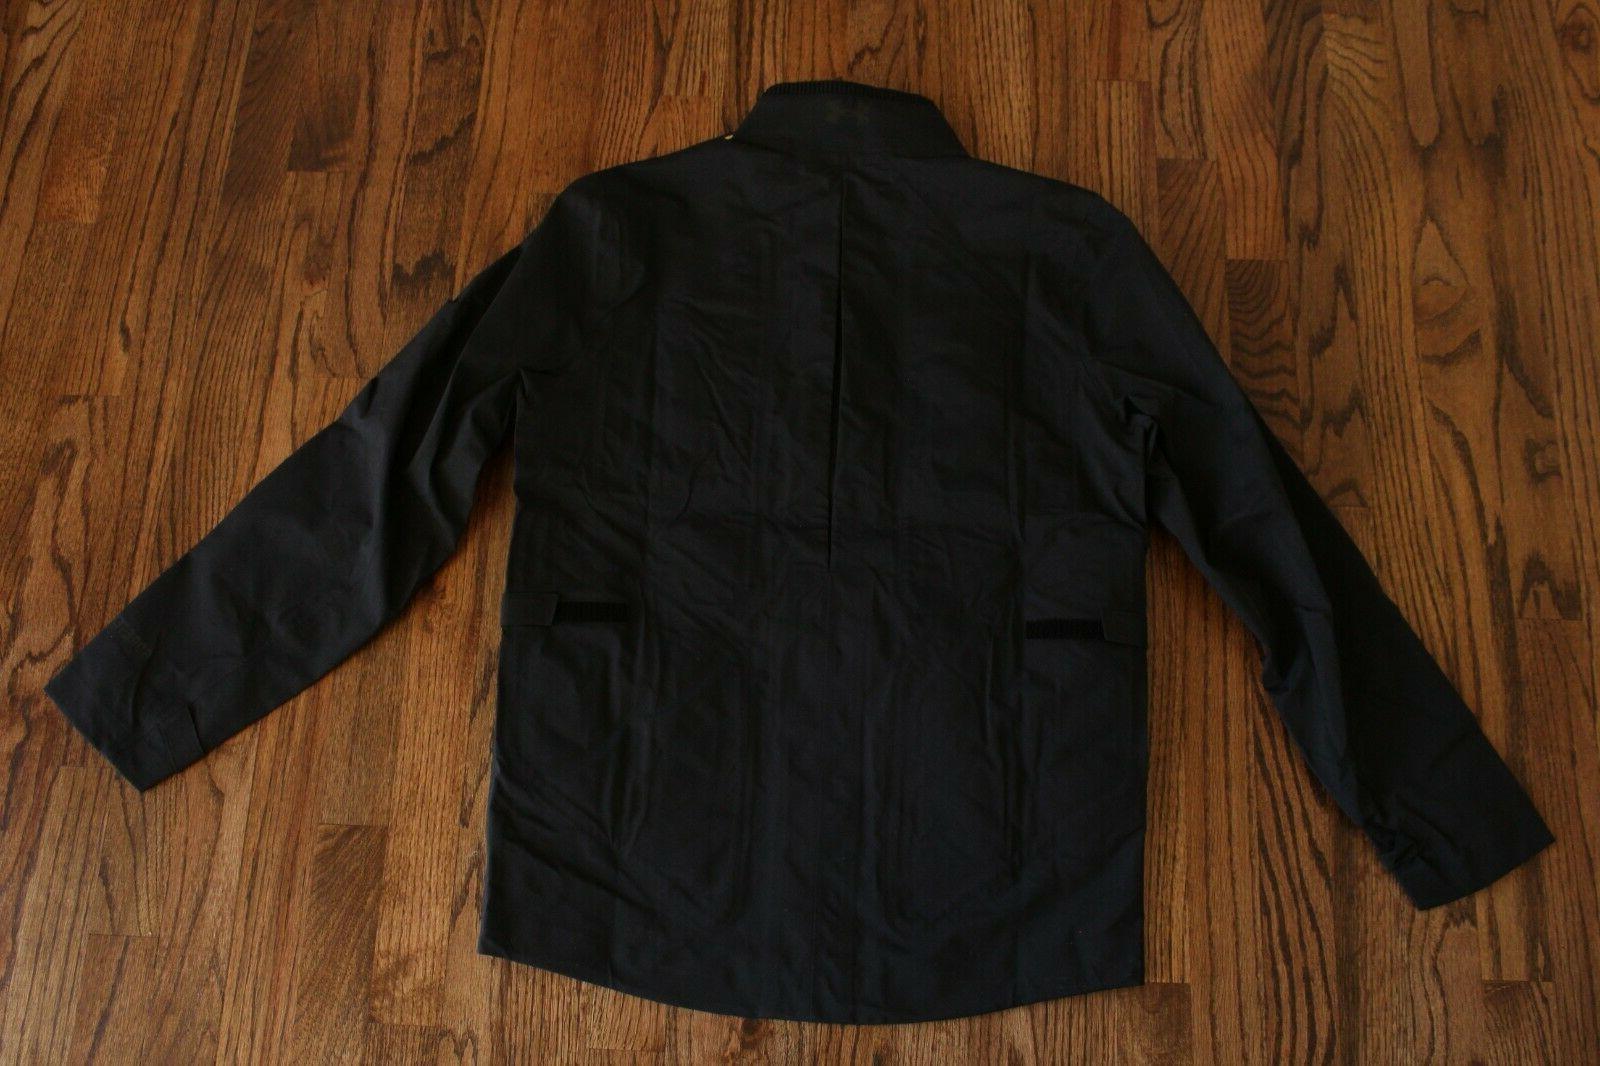 47 Under GoreTex M Full Jacket $400